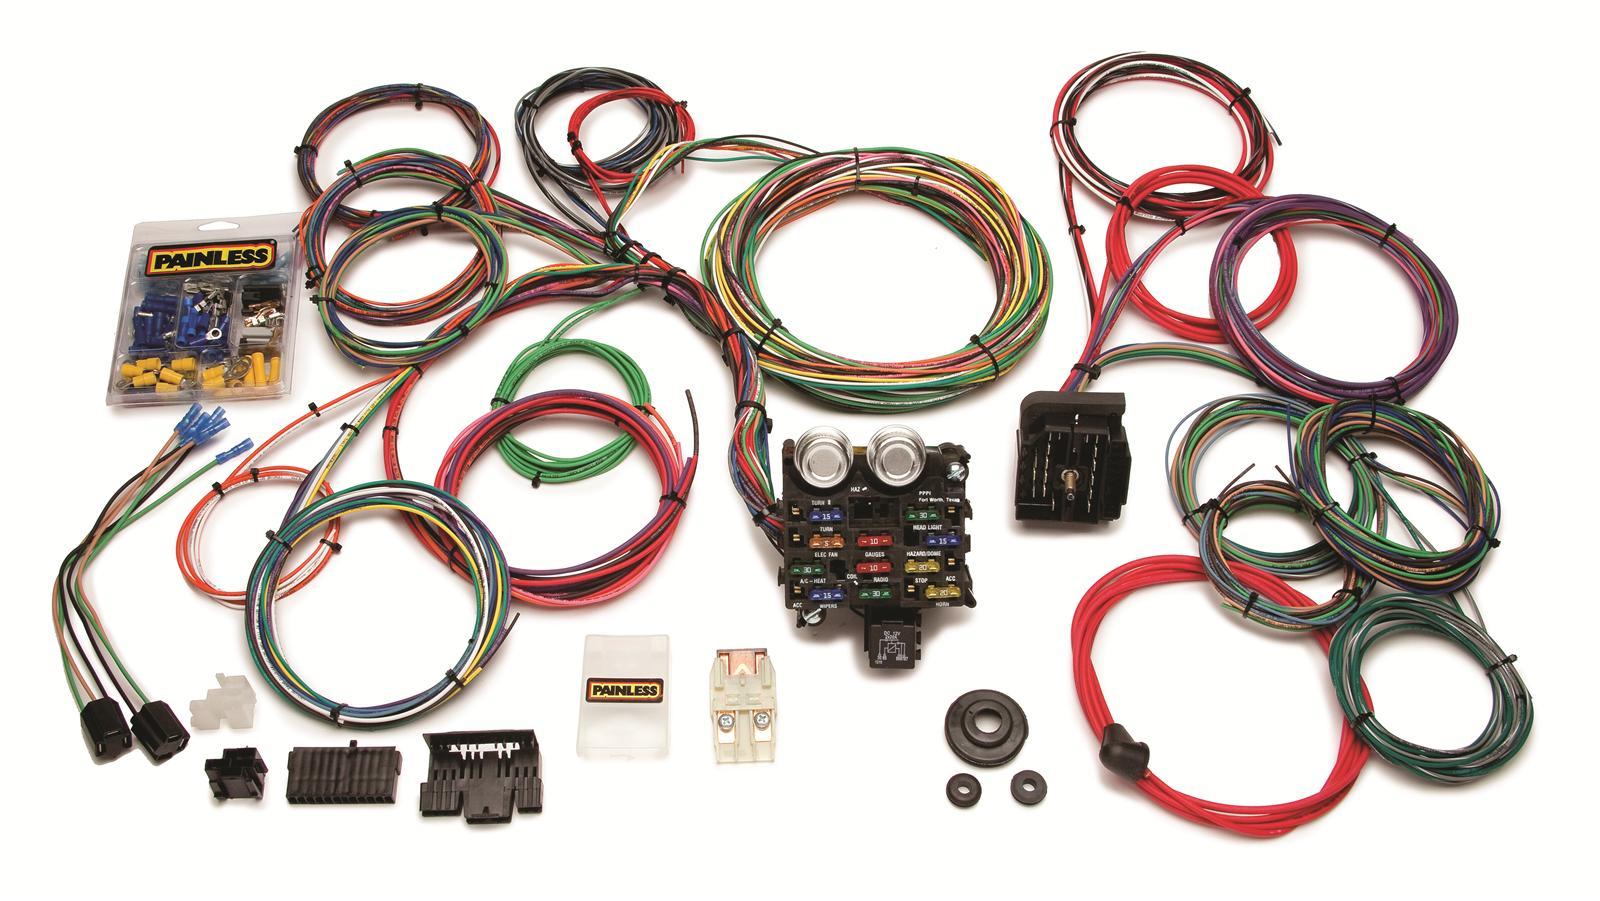 Painless Wiring Harness Mopar Universal Kit 20103 Car Ebay